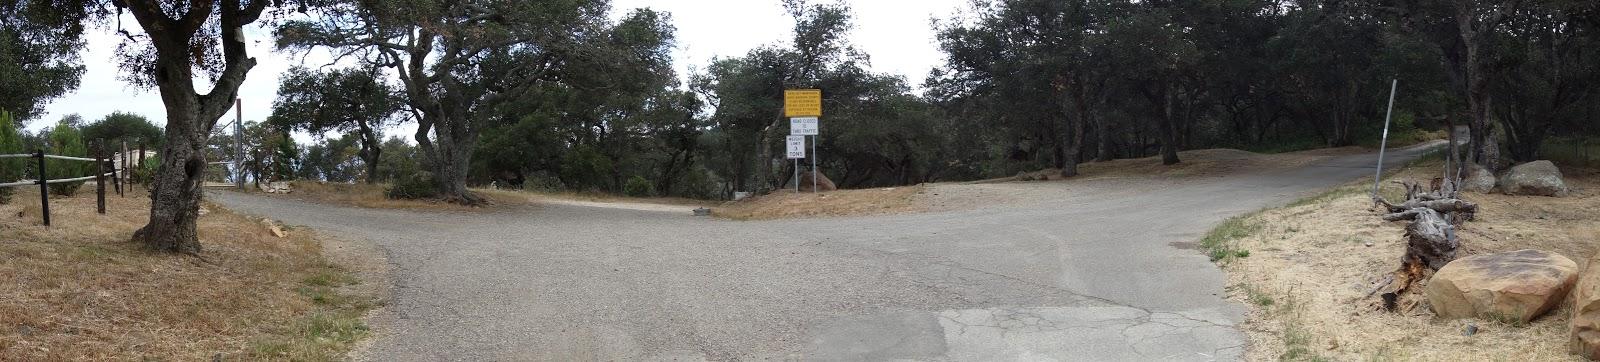 Riding bike up Refugio Road - pano of Refugio Pass and road sign